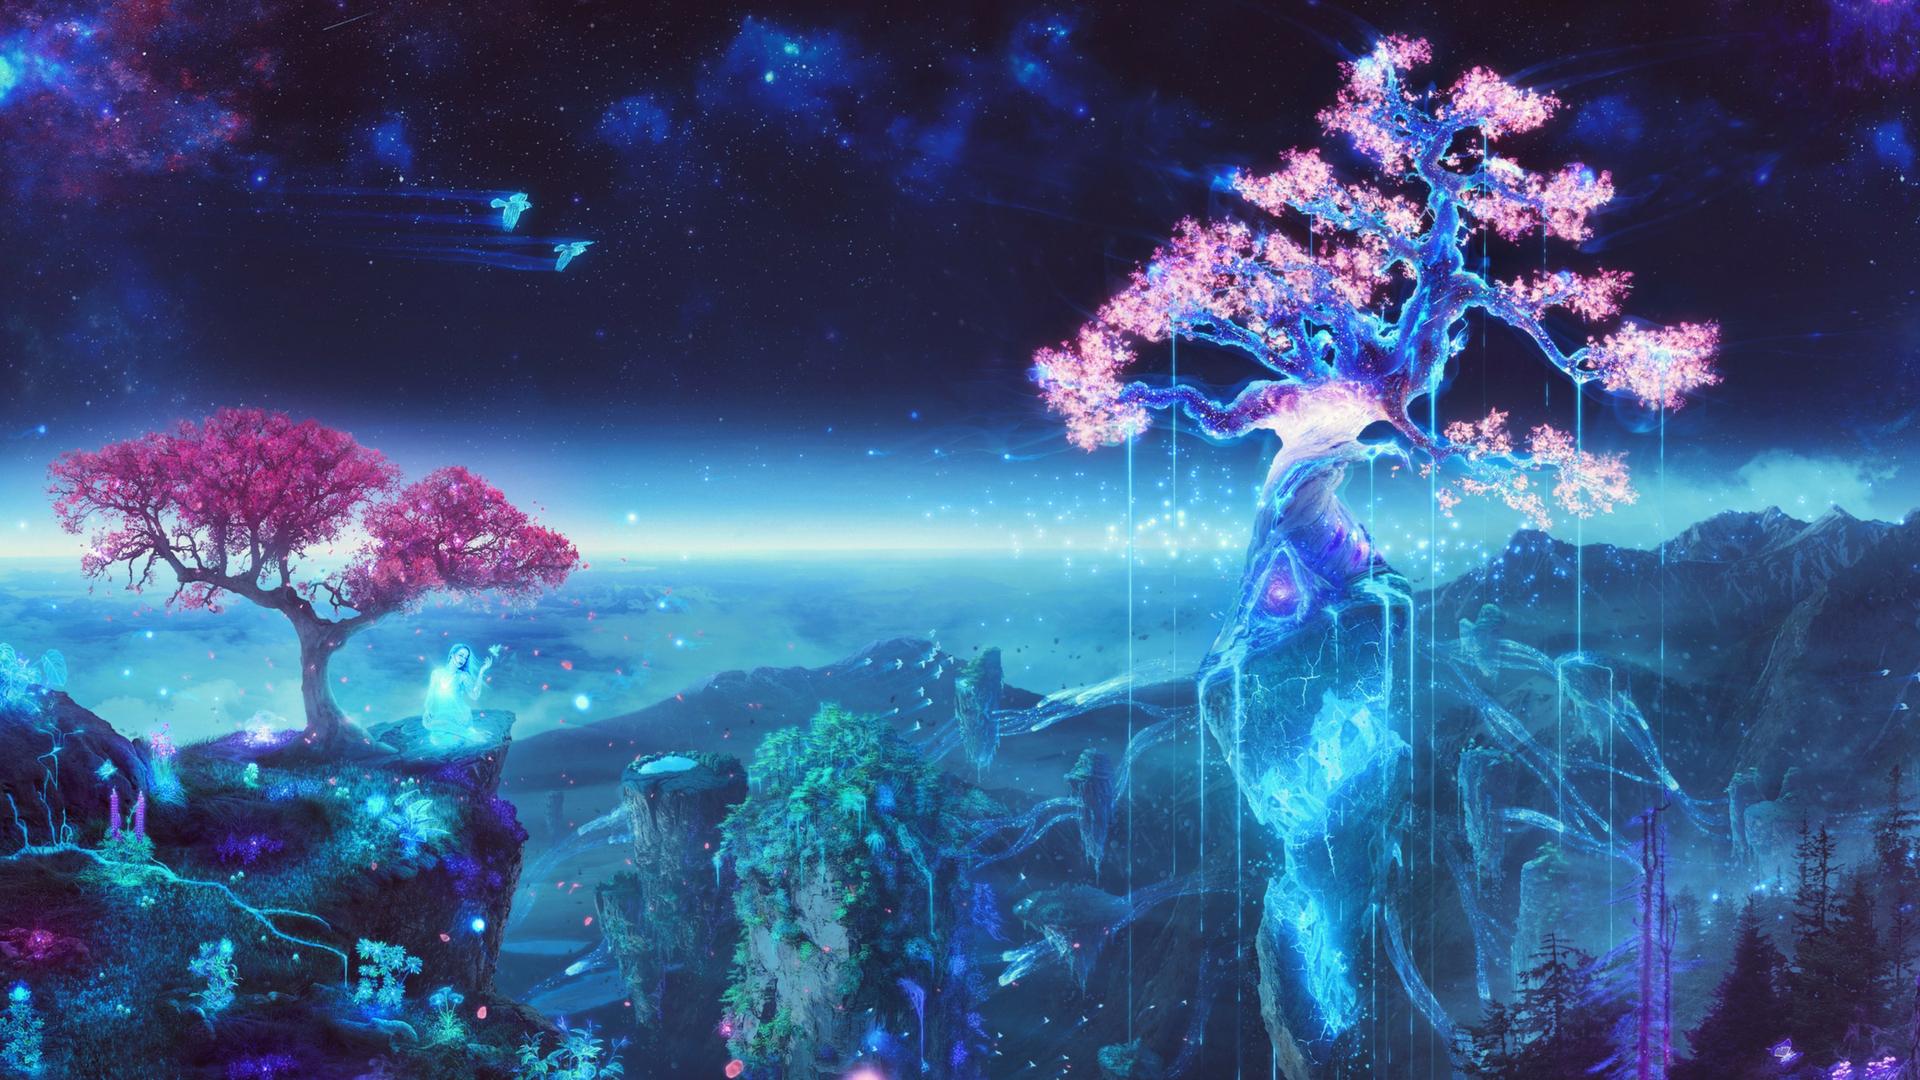 Anime 1920x1080 anime magic digital art fantasy art Bálint Budai